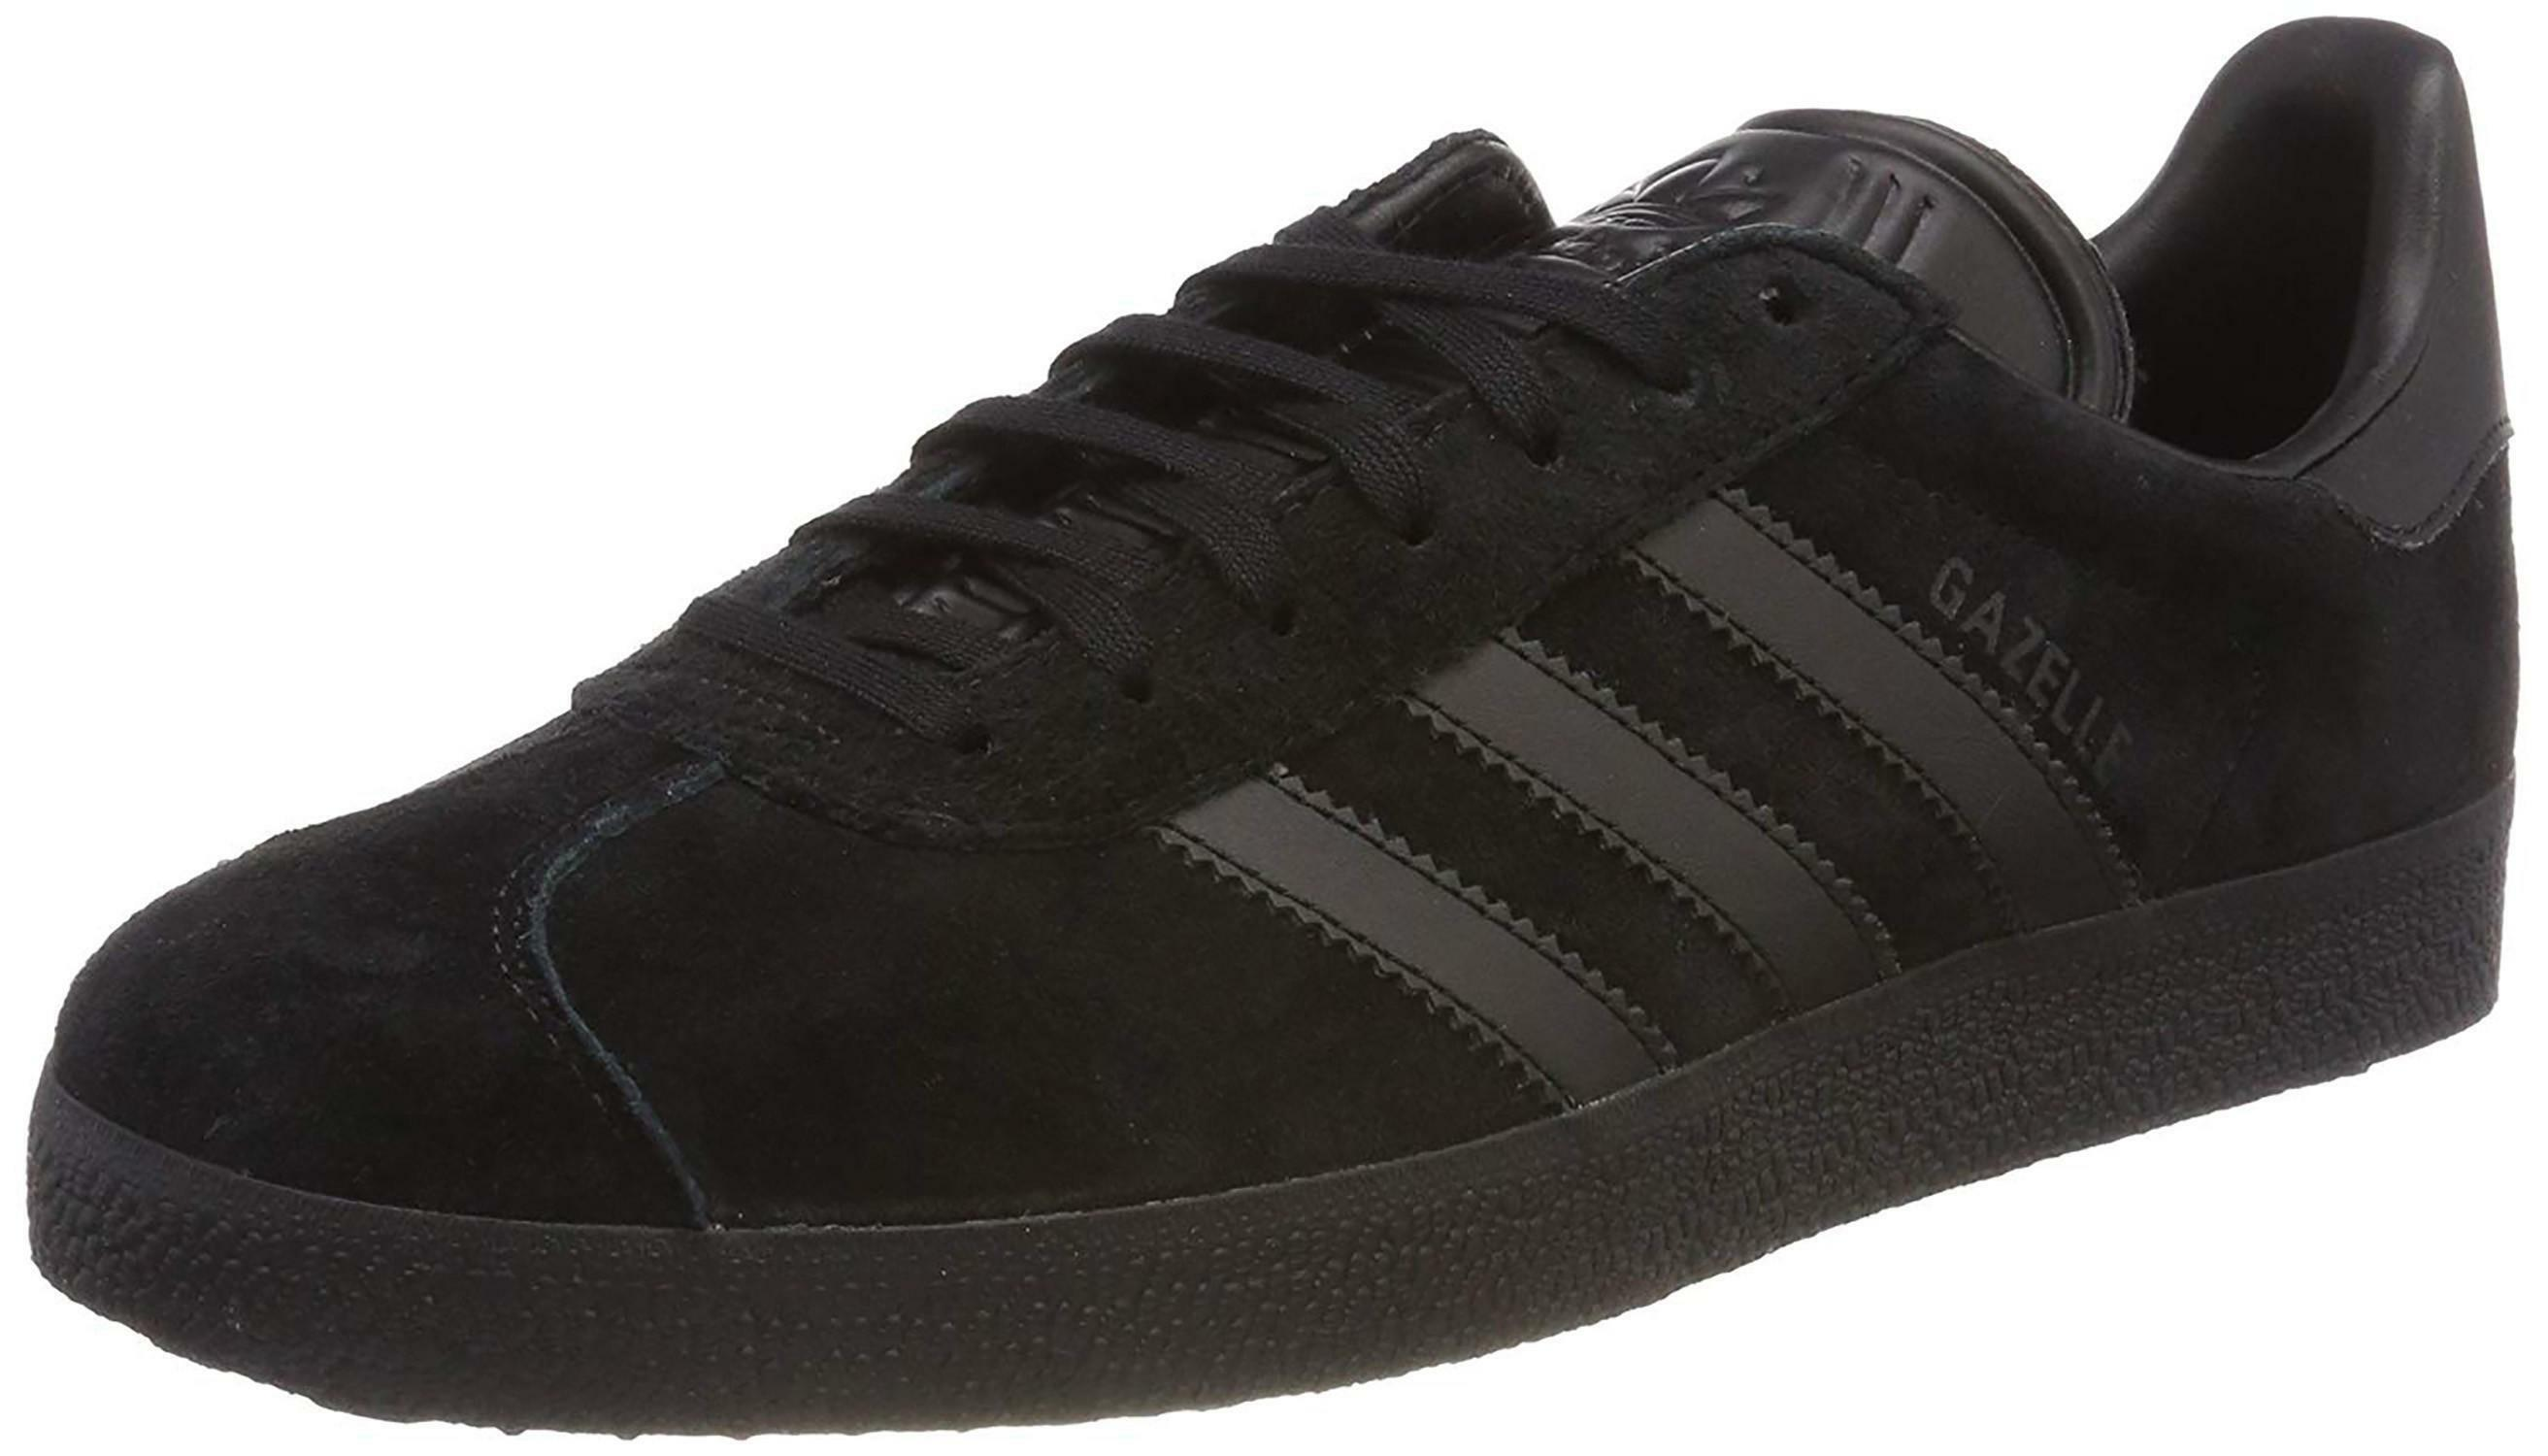 Adidas gazelle scarpe sportive uomo nere cq2809